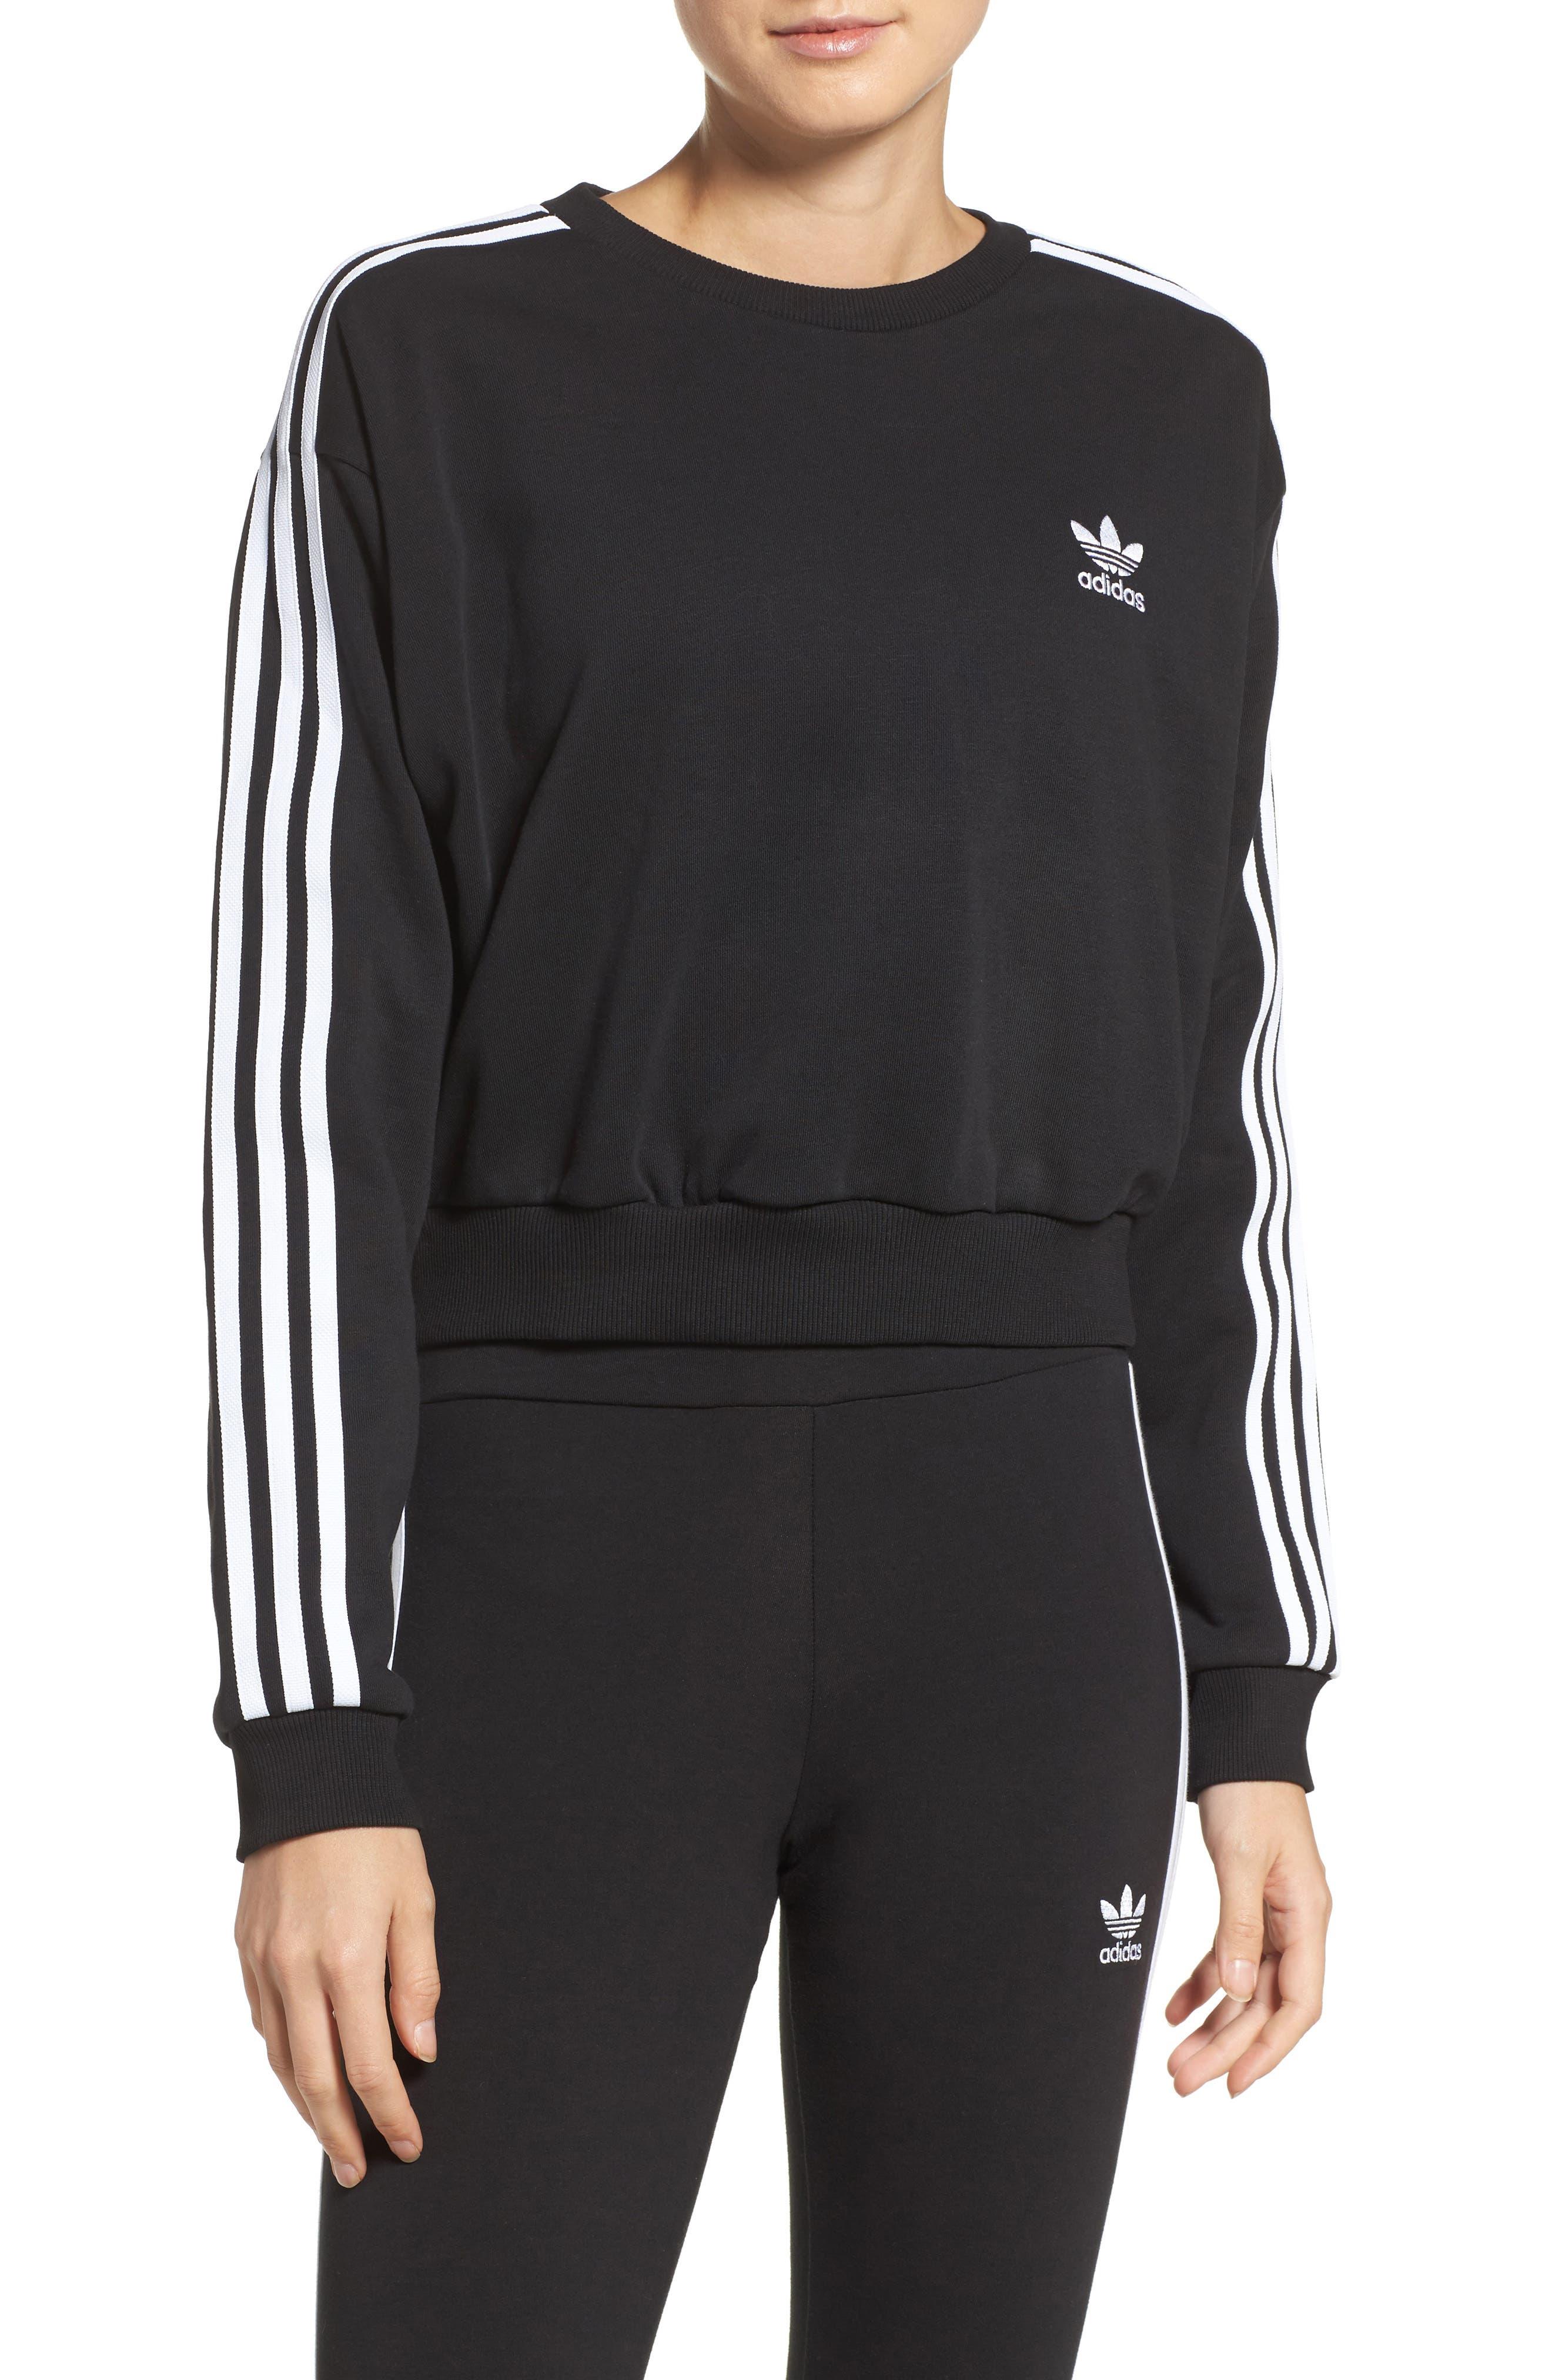 Alternate Image 1 Selected - adidas Originals 3-Stripes Crop Sweatshirt